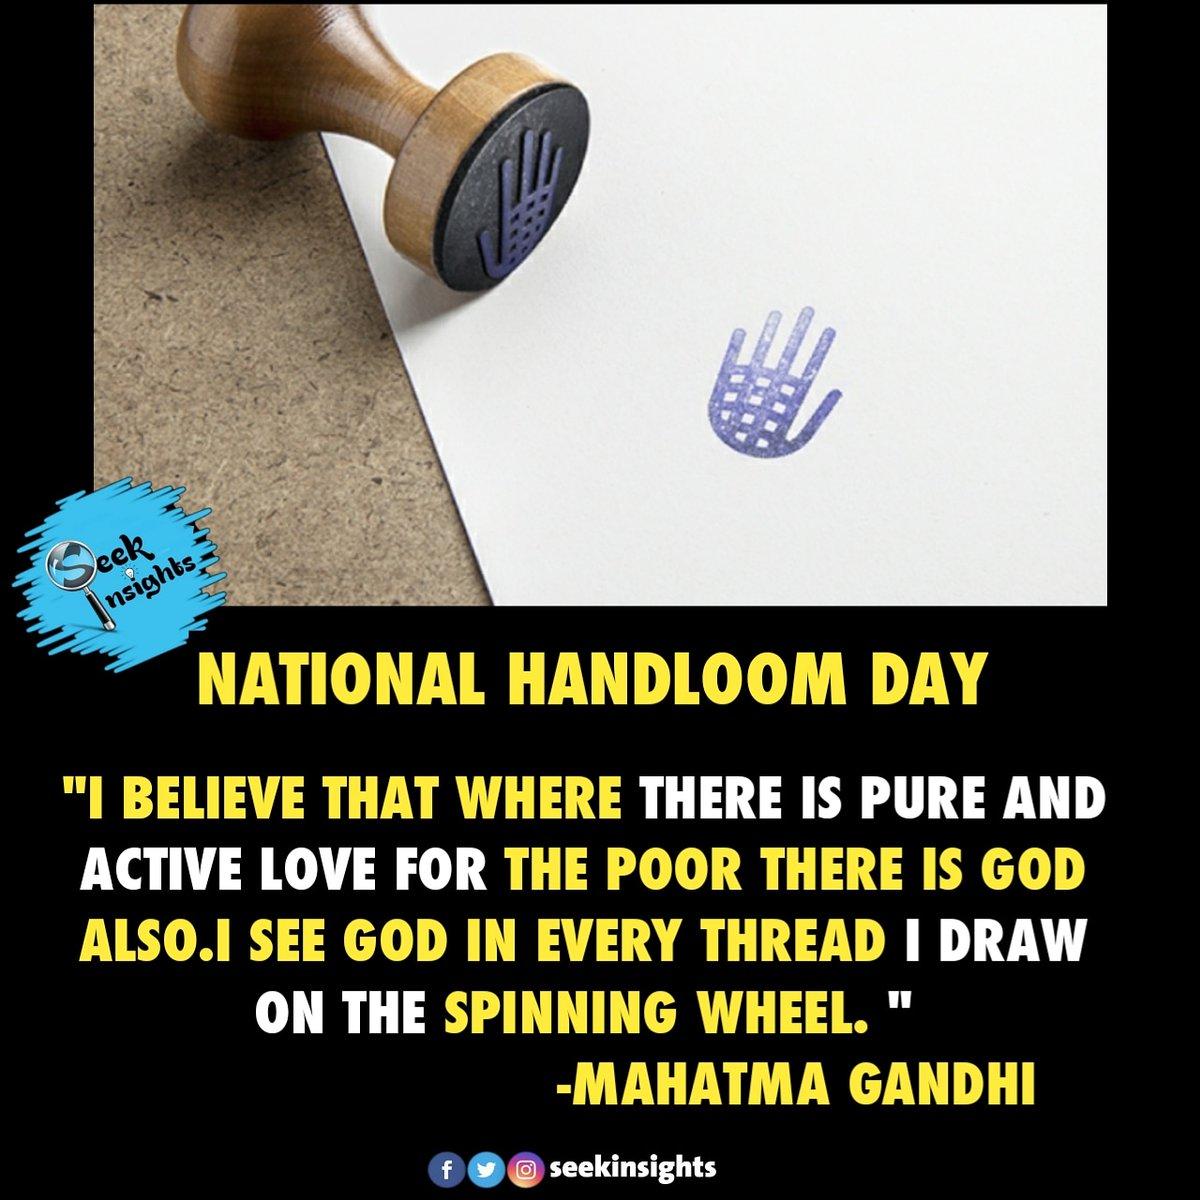 Dofollow #Seekinsights1  . . . . #handloom #saree #sareelove #iwearhandloom #handwoven #sarees #handmade #silk #sareepact #fashion #sareesofinstagram #weavesofindia #handloomsarees #indianwear #silksarees #handloomlove #ethnicwear #onlineshopping #handloomsaree #sareeloverspic.twitter.com/Fmqn8qNjko